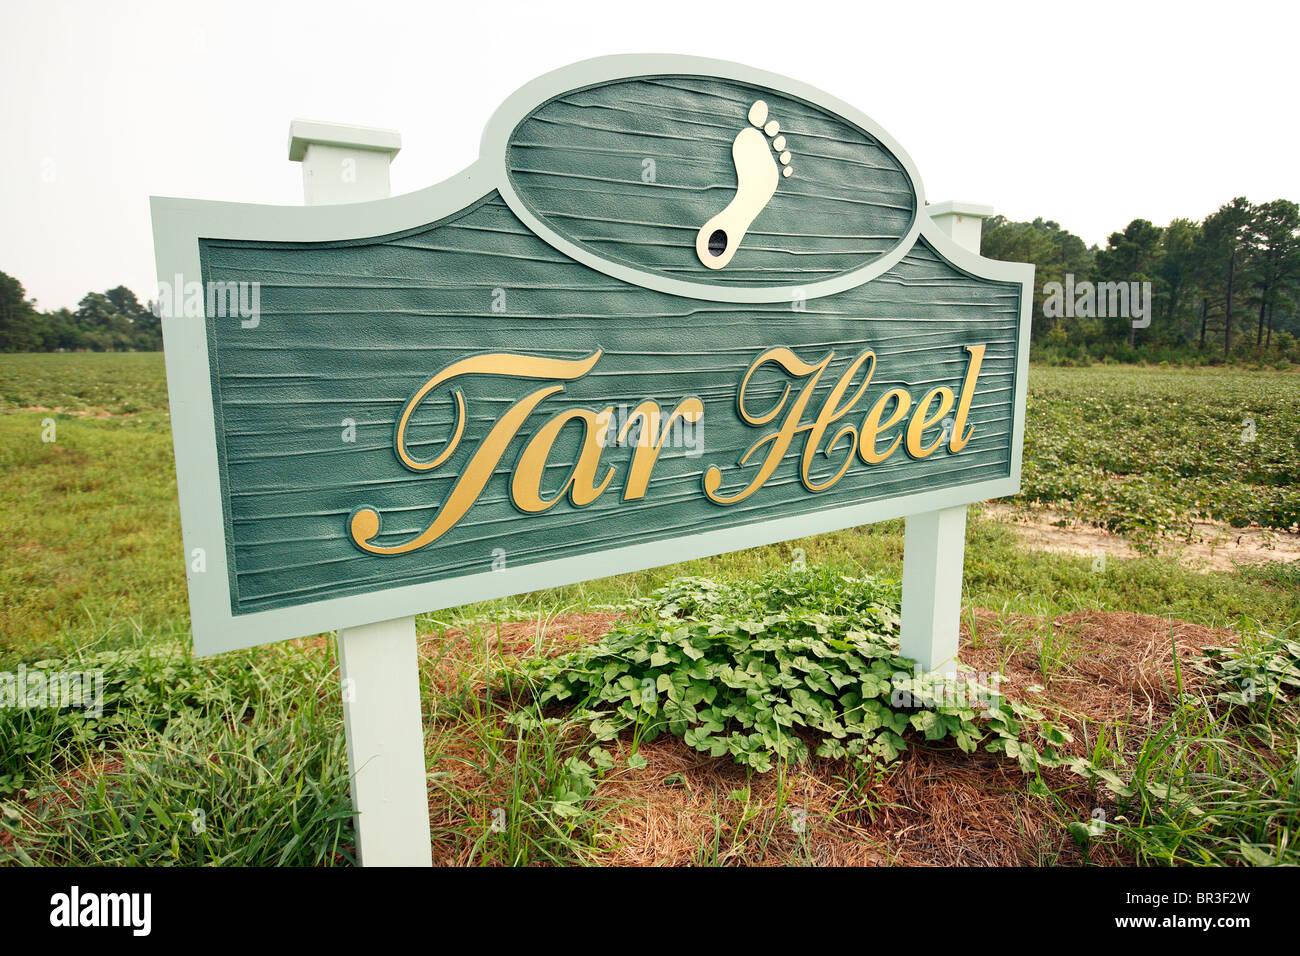 The City of Tar Heel sign Stock Photo